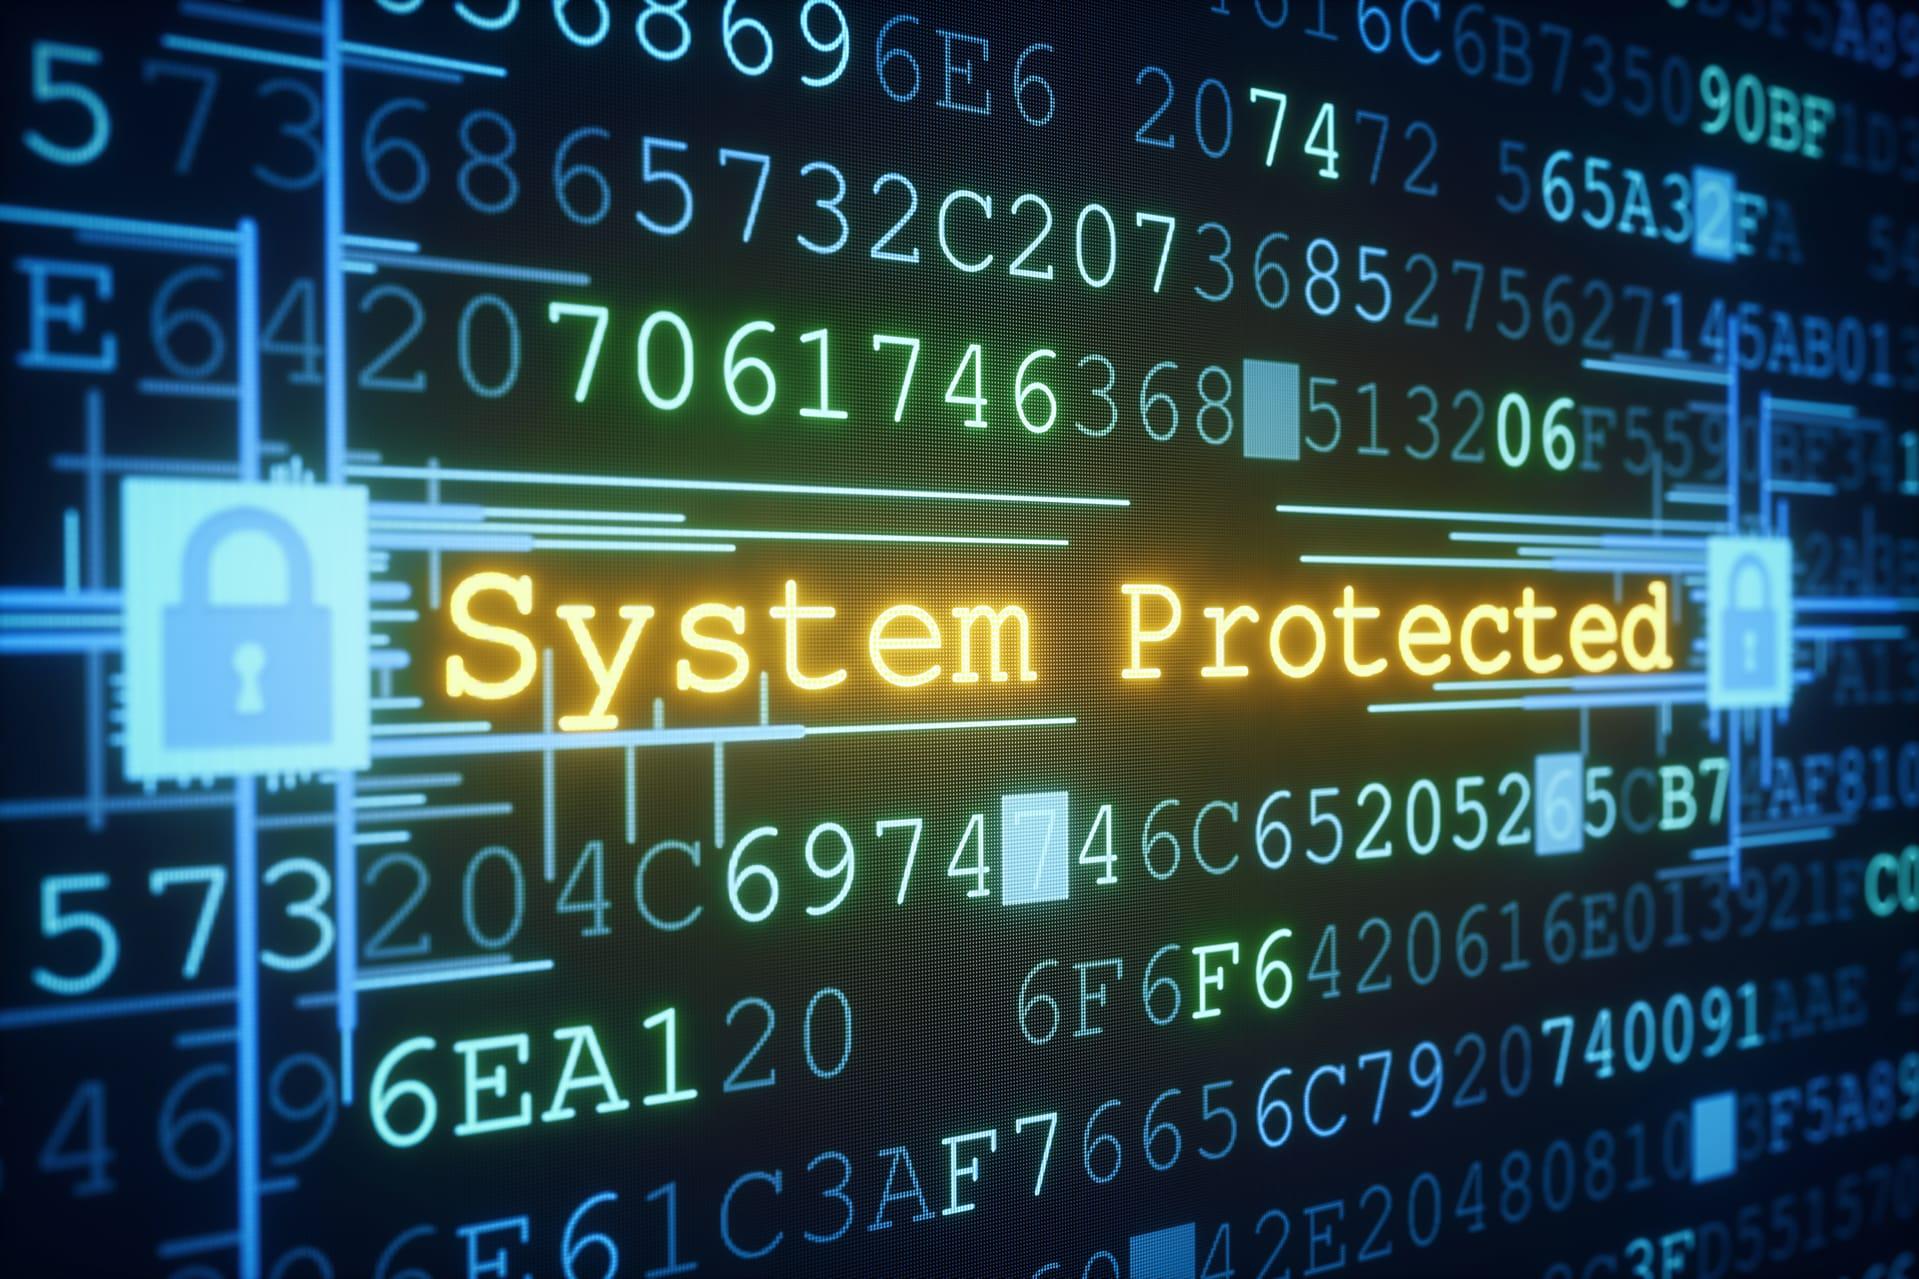 Computer Security | Information Security | Firewalls